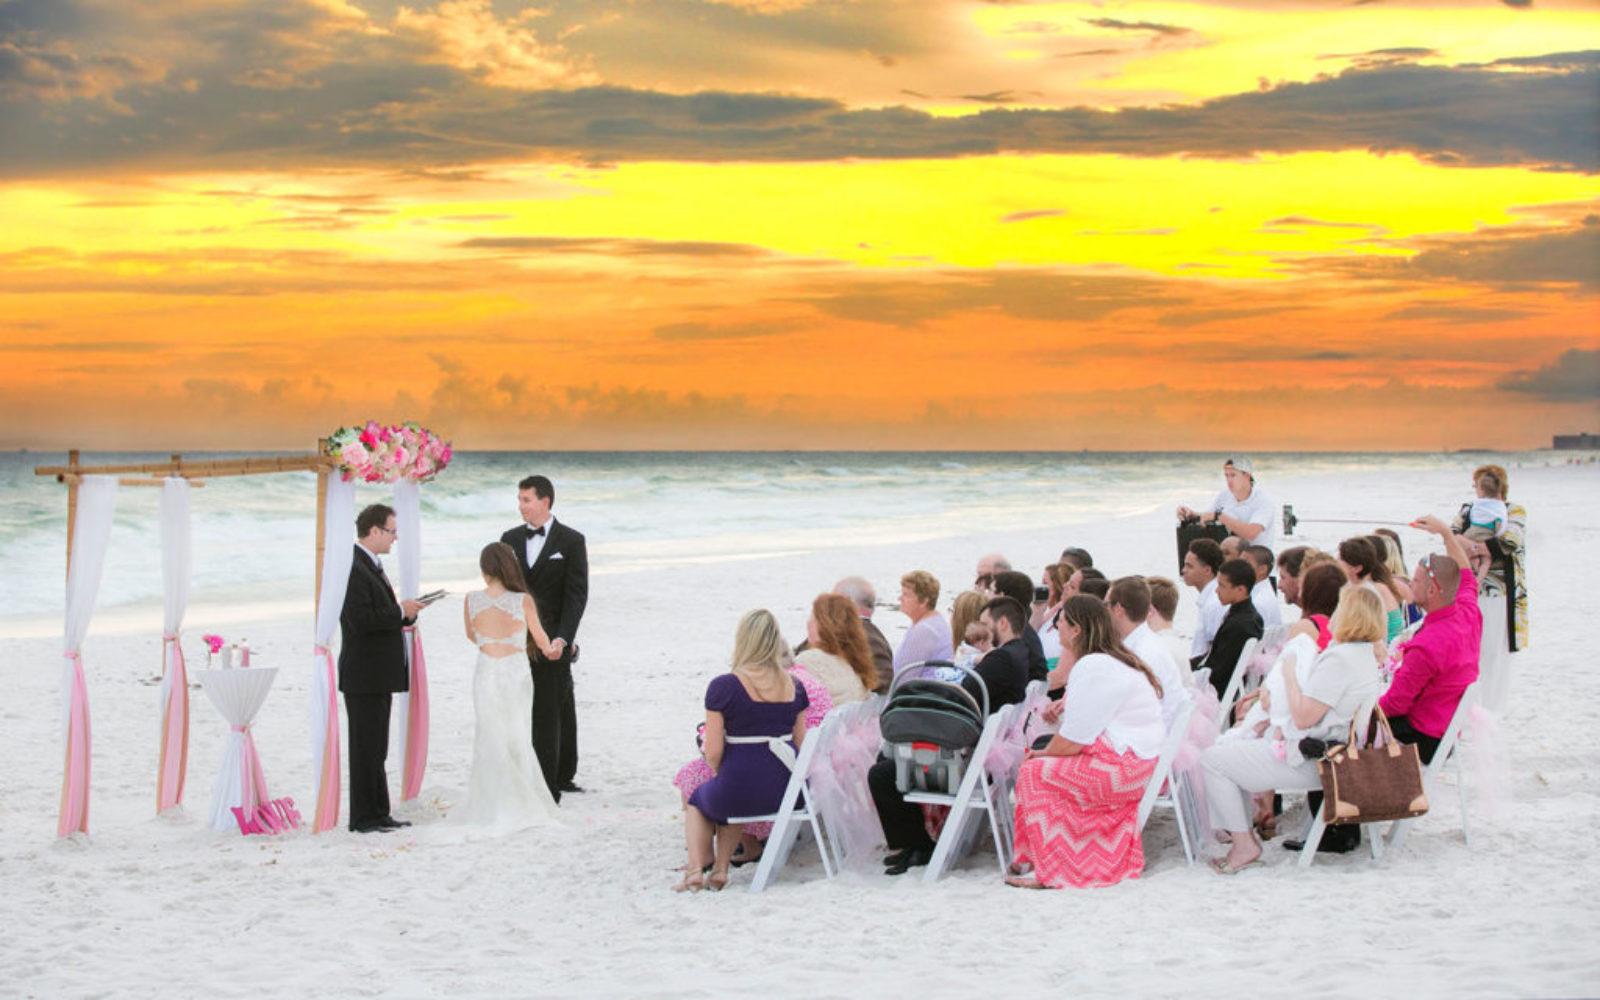 weddingphotographycoloradosprings_41-1024x640